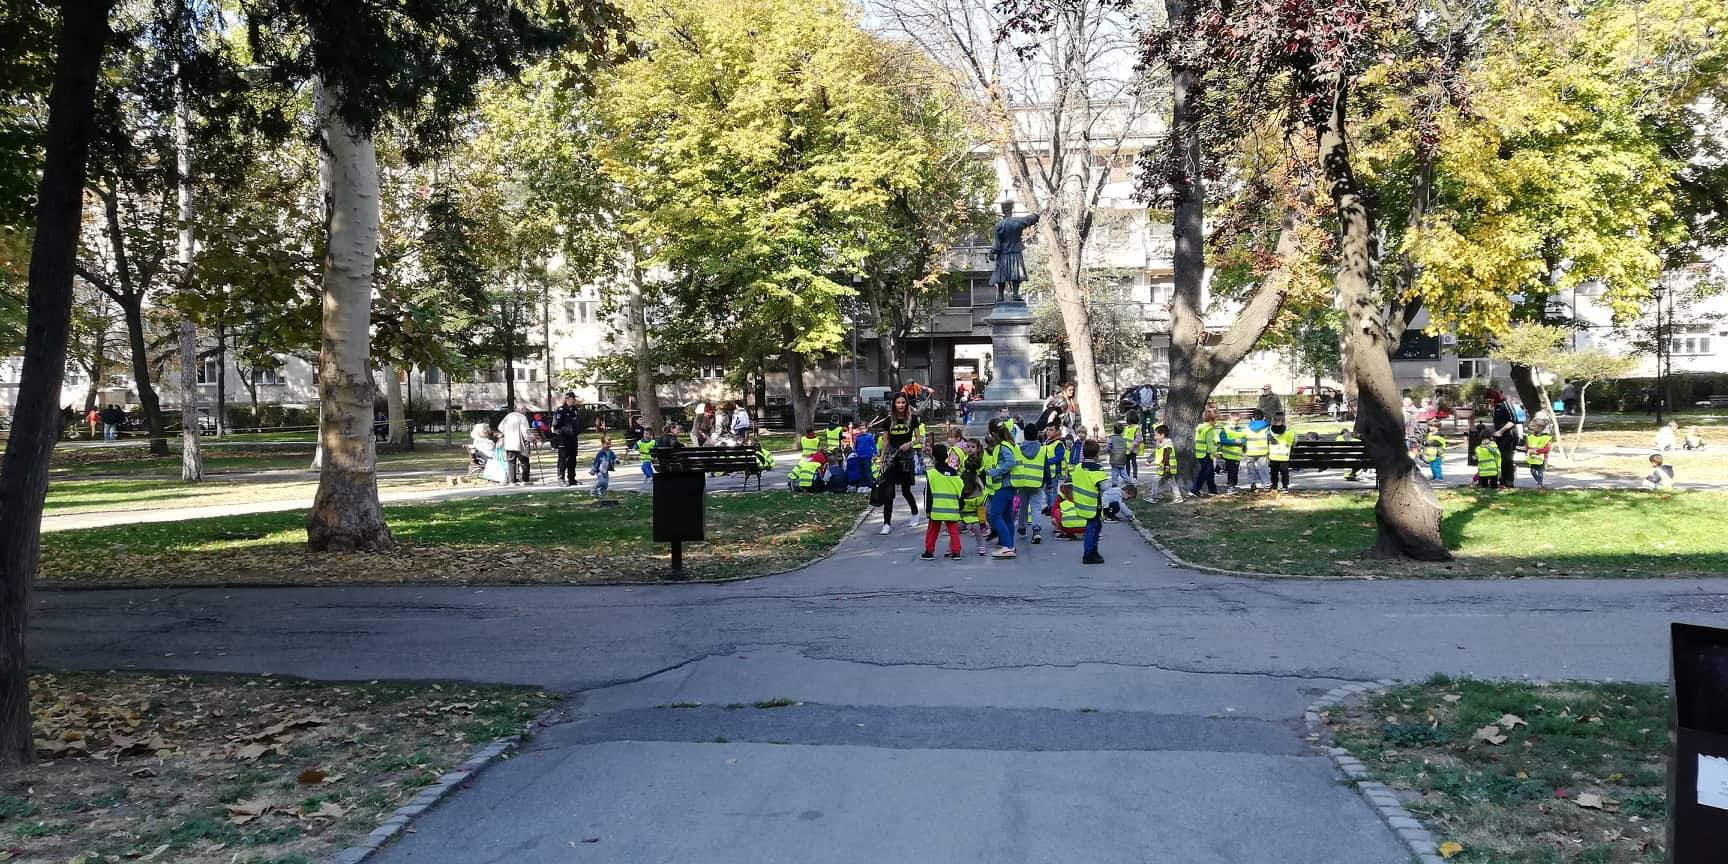 "Predškolska ustanova ""Ljubica Vrebalov"" vrtić Pčelica, iskoristila je lep dan i sve grupe izvela na druženje, svež vazduh... 9272"